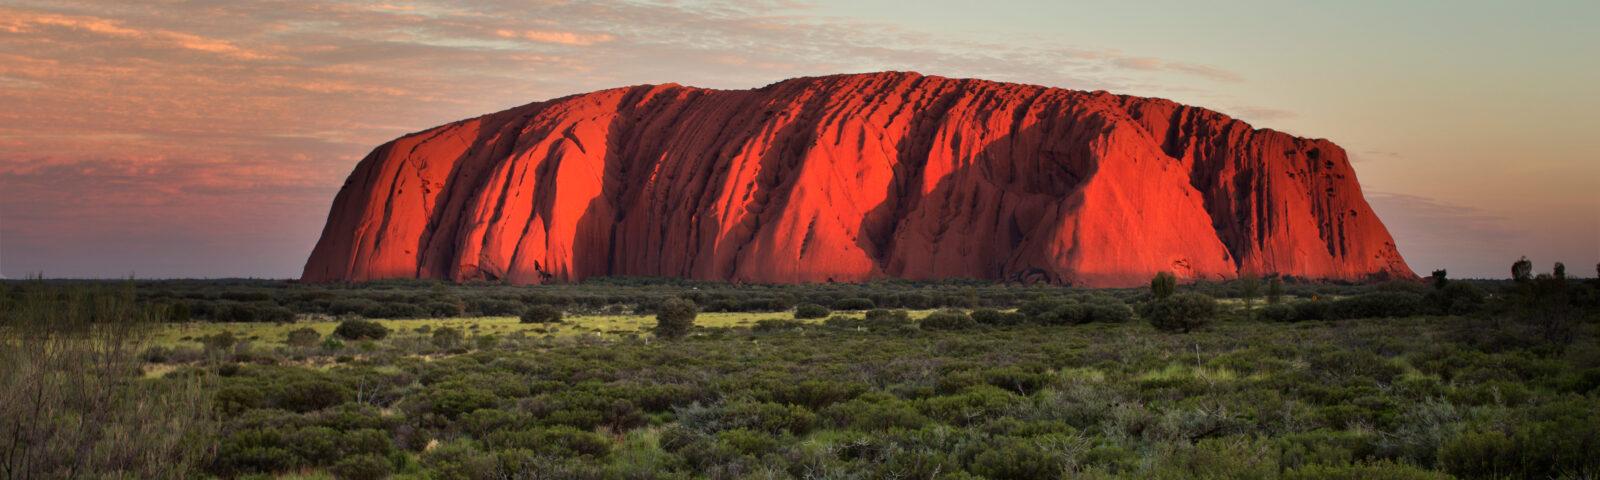 On Uluru and international agreements Down-Under